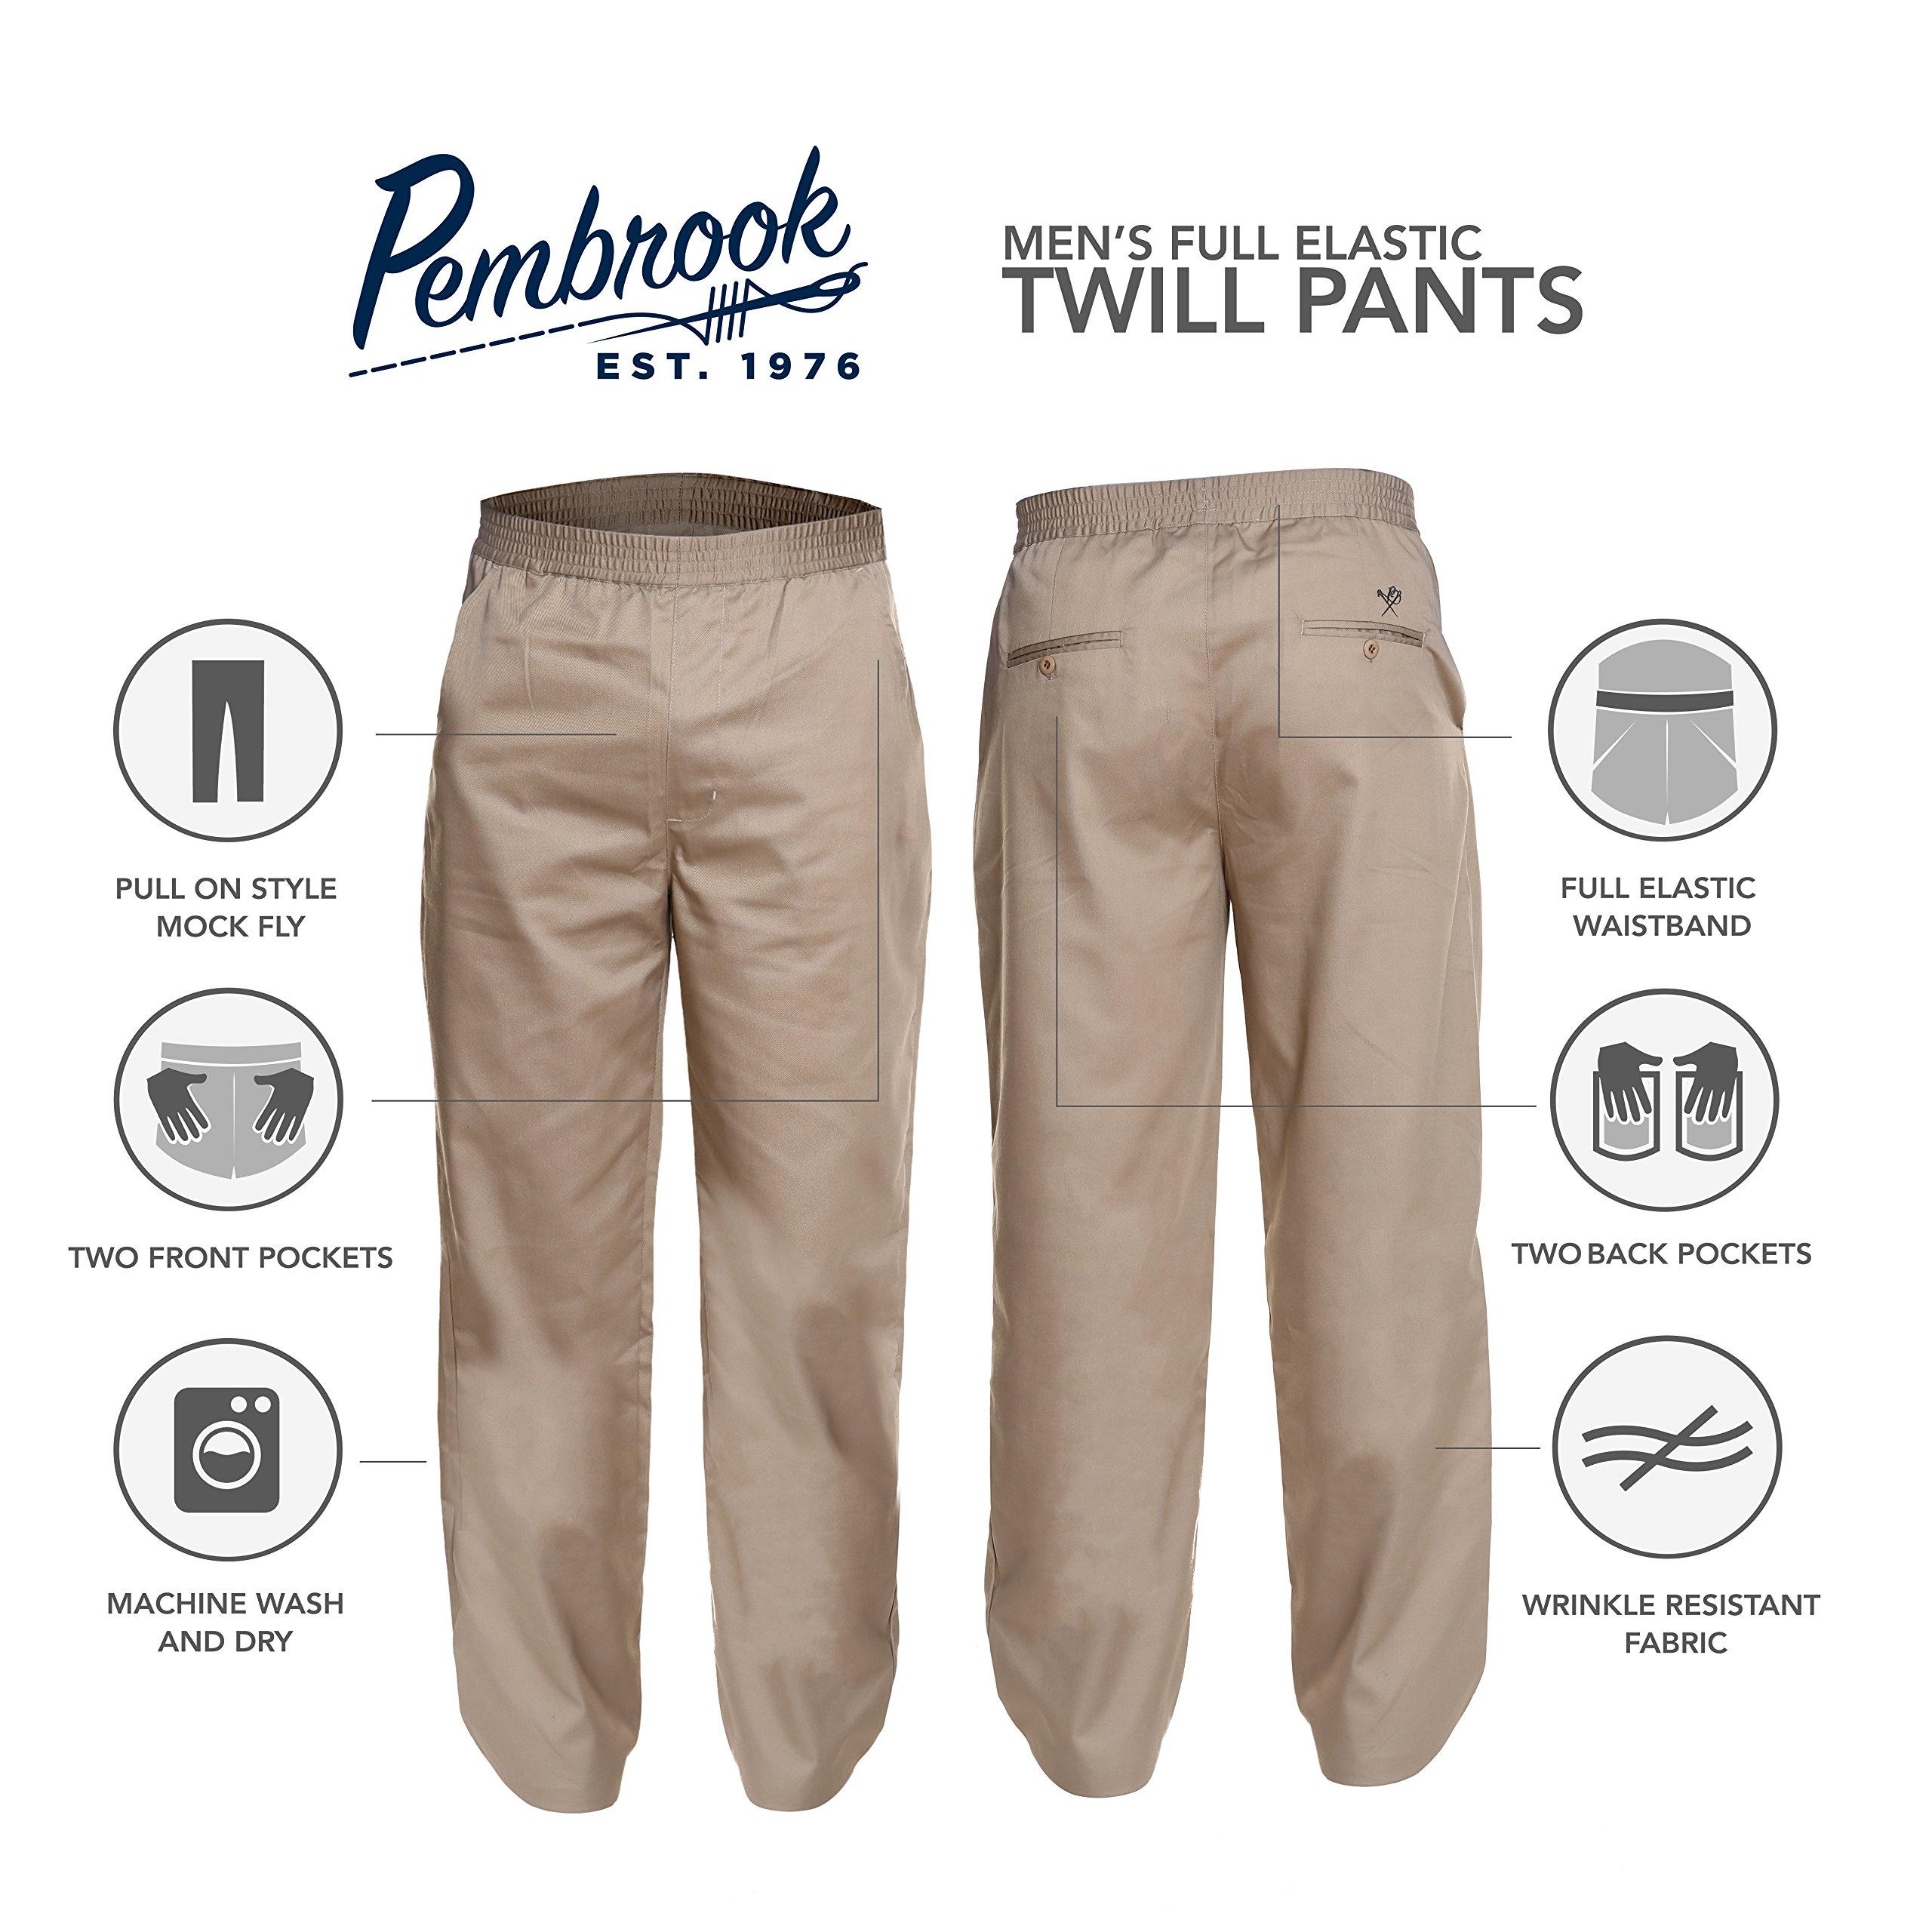 Pembrook Men's Full Elastic Waist Twill Casual Pant - L - Tan by Pembrook (Image #8)